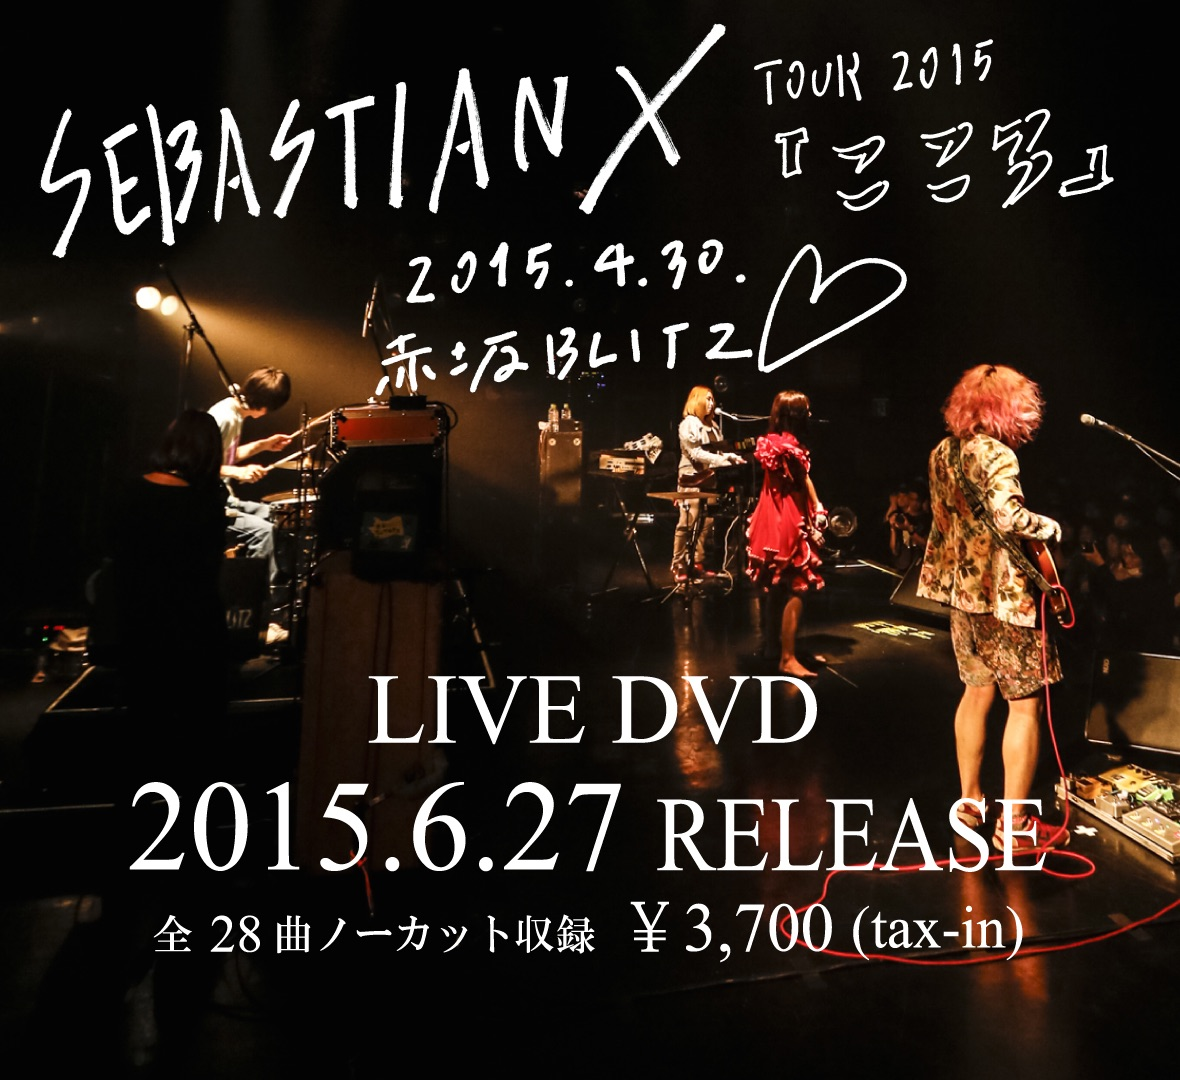 http://rooftop.cc/news/2015/06/05/seba_dvd_header.jpg